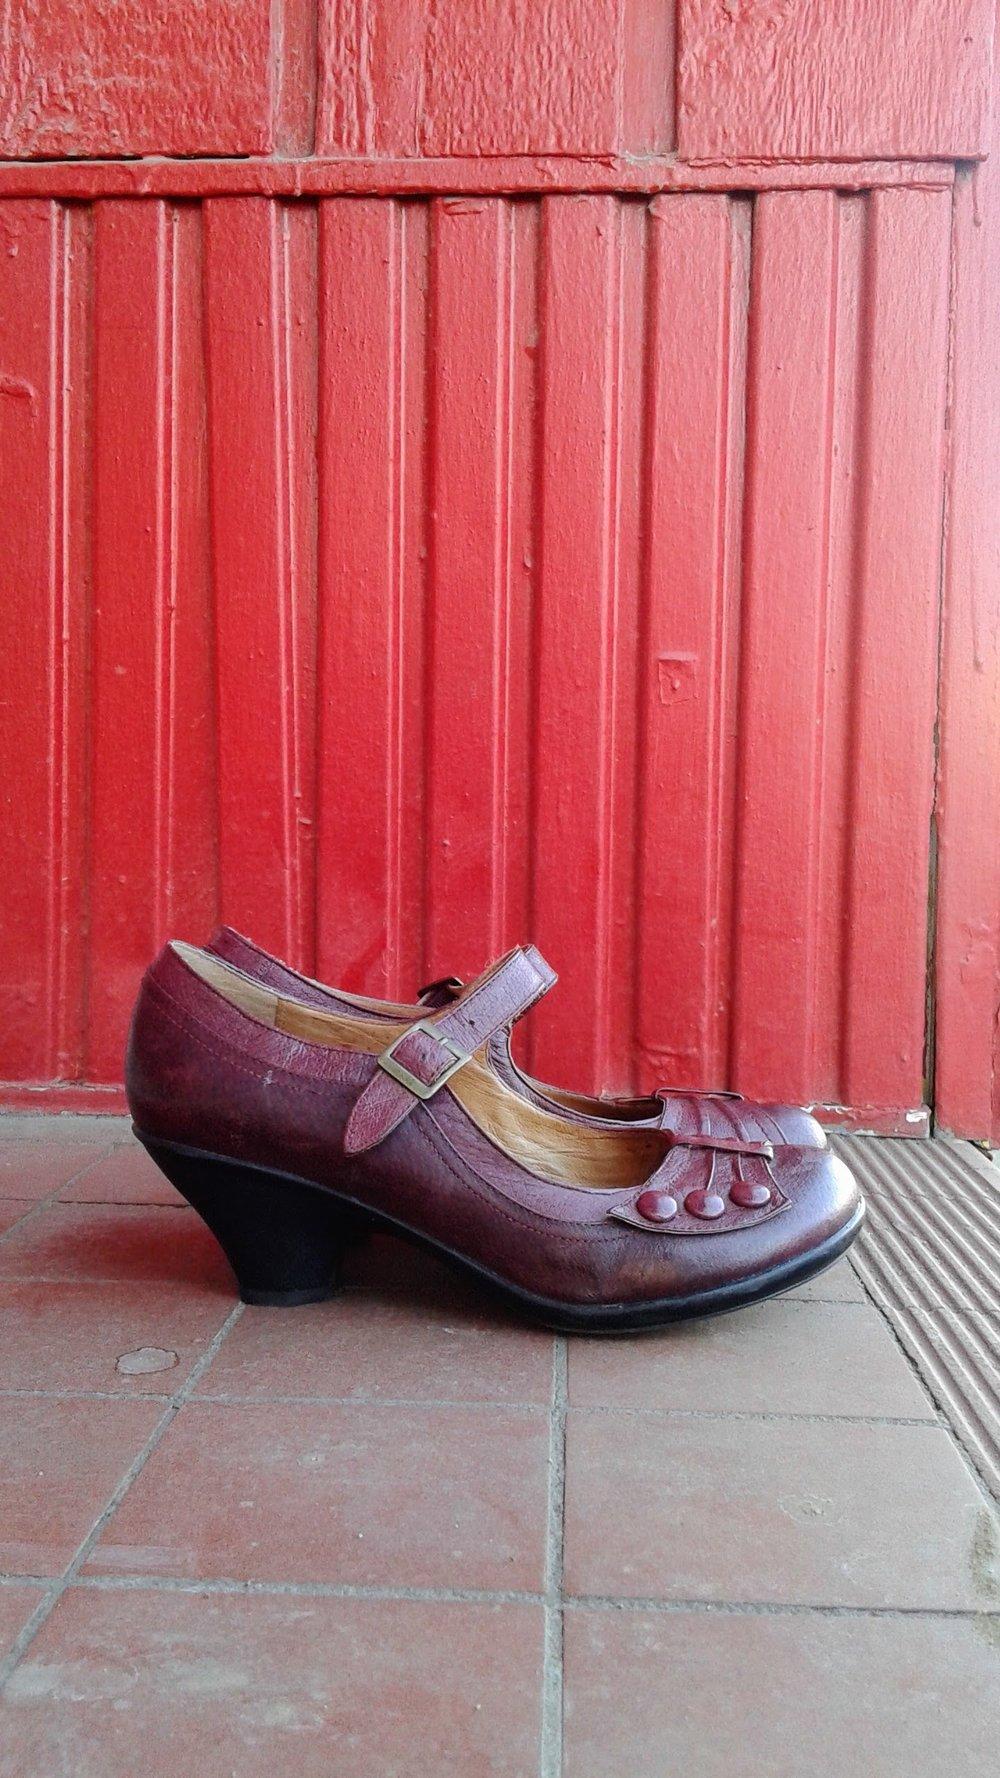 Miz Mooz shoes; S8.5, $45